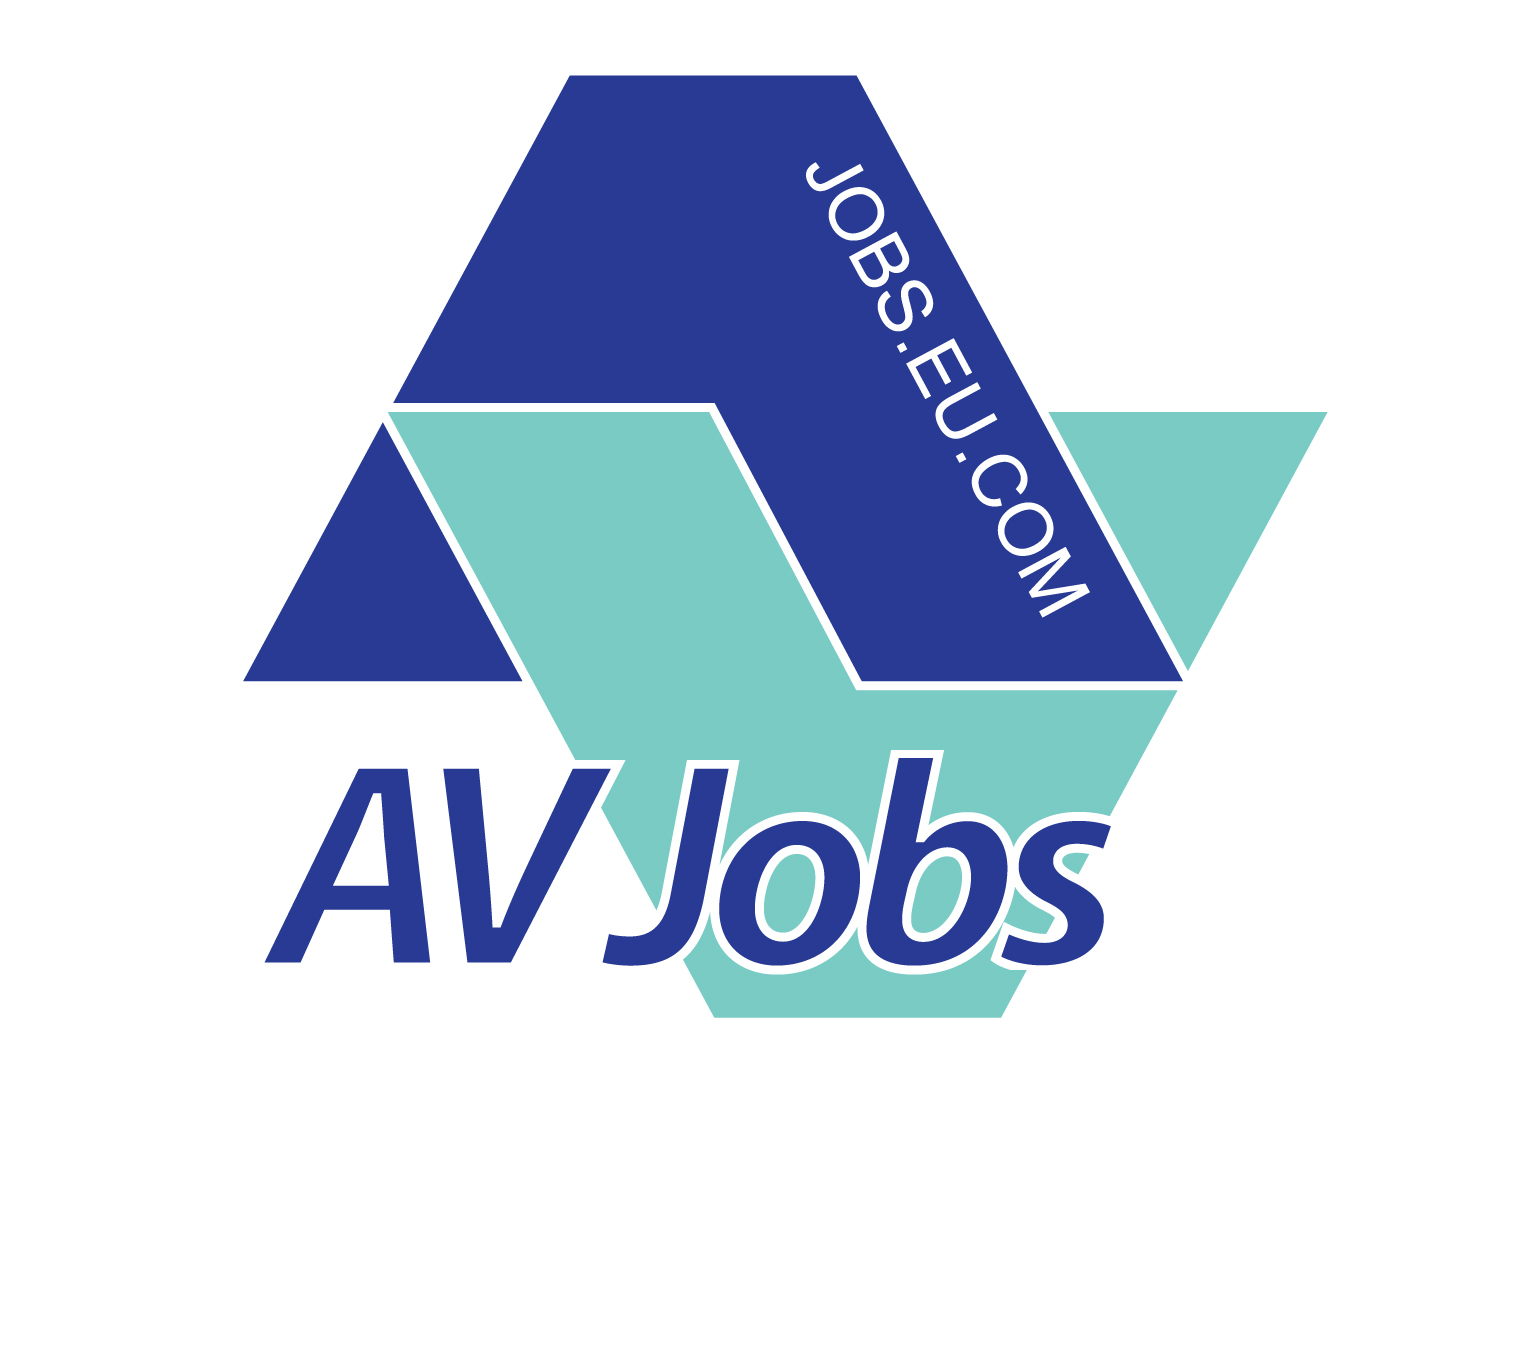 Elementary Resources Ltd, T/A AV Jobs